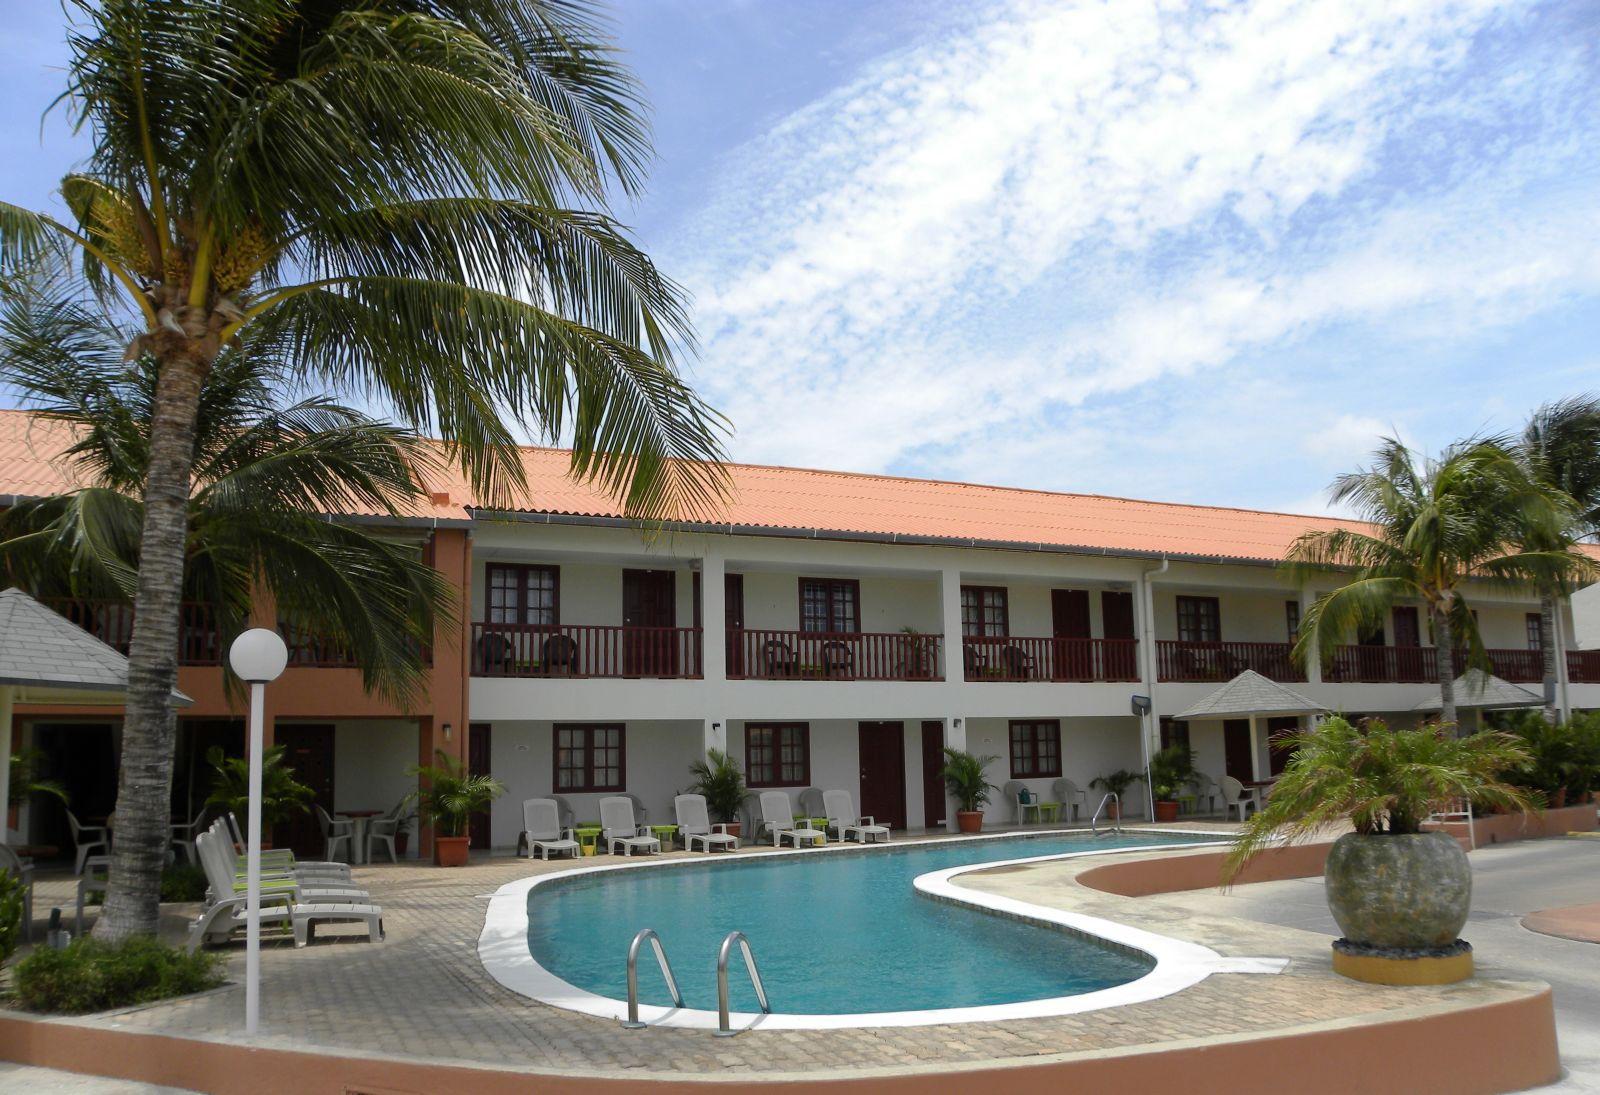 Gallery Aruba Quality Apartments